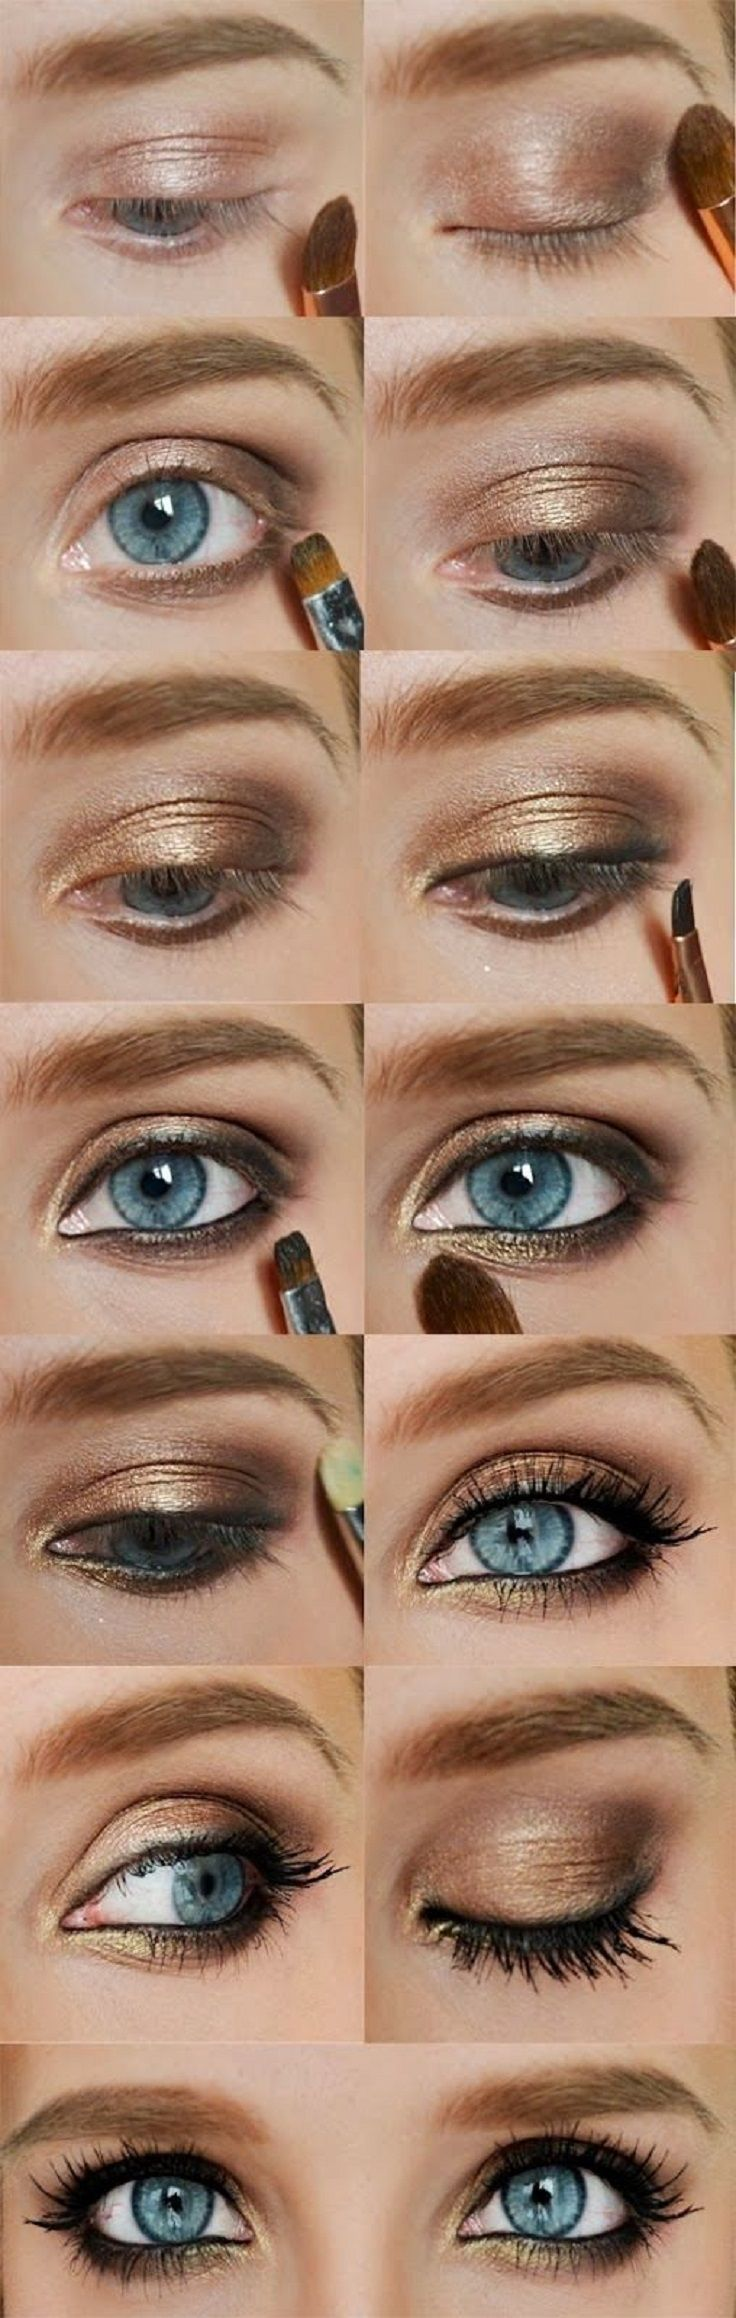 makeup tutorial for blue eyes and brown hair   saubhaya makeup